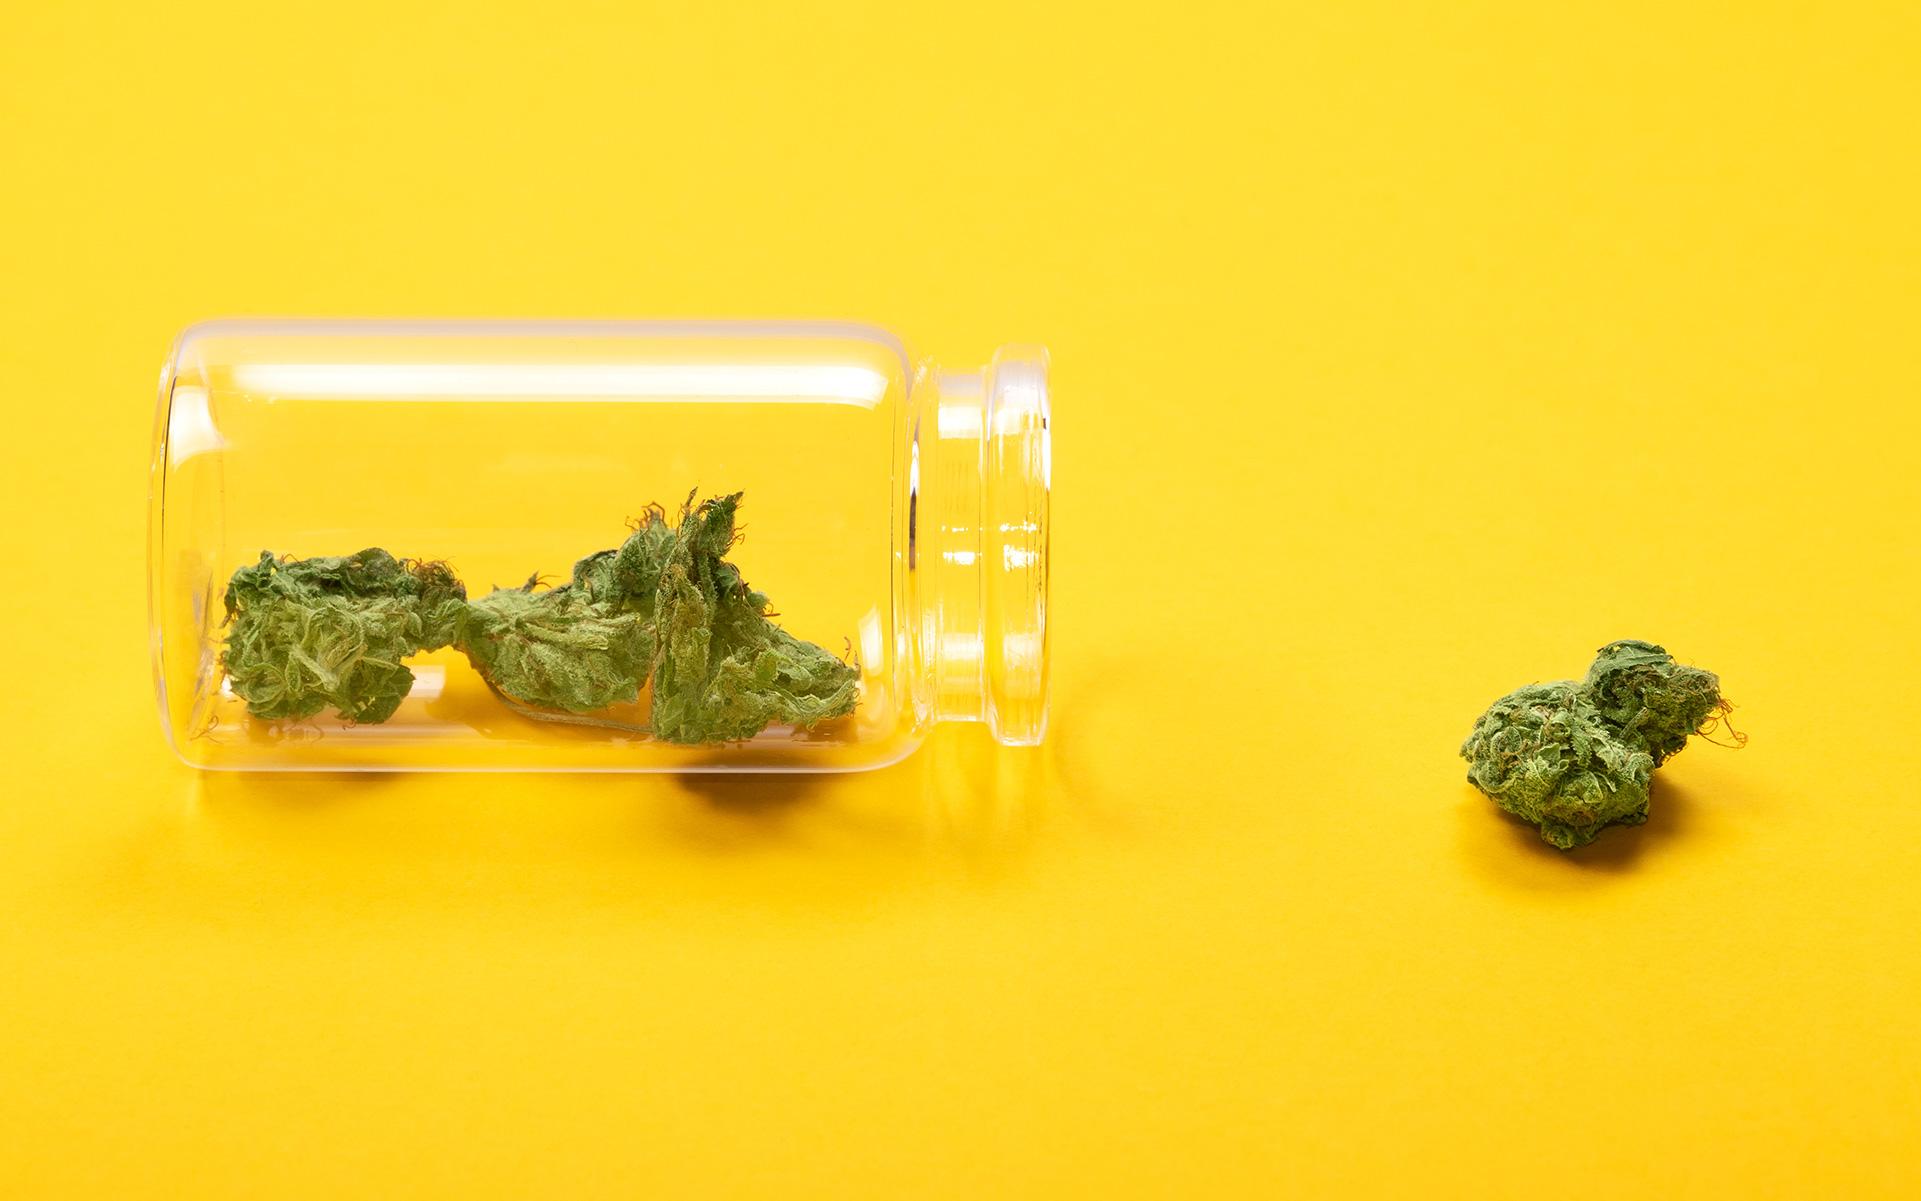 CBD marijuana strains, THC marijuana strains, growing cannabis